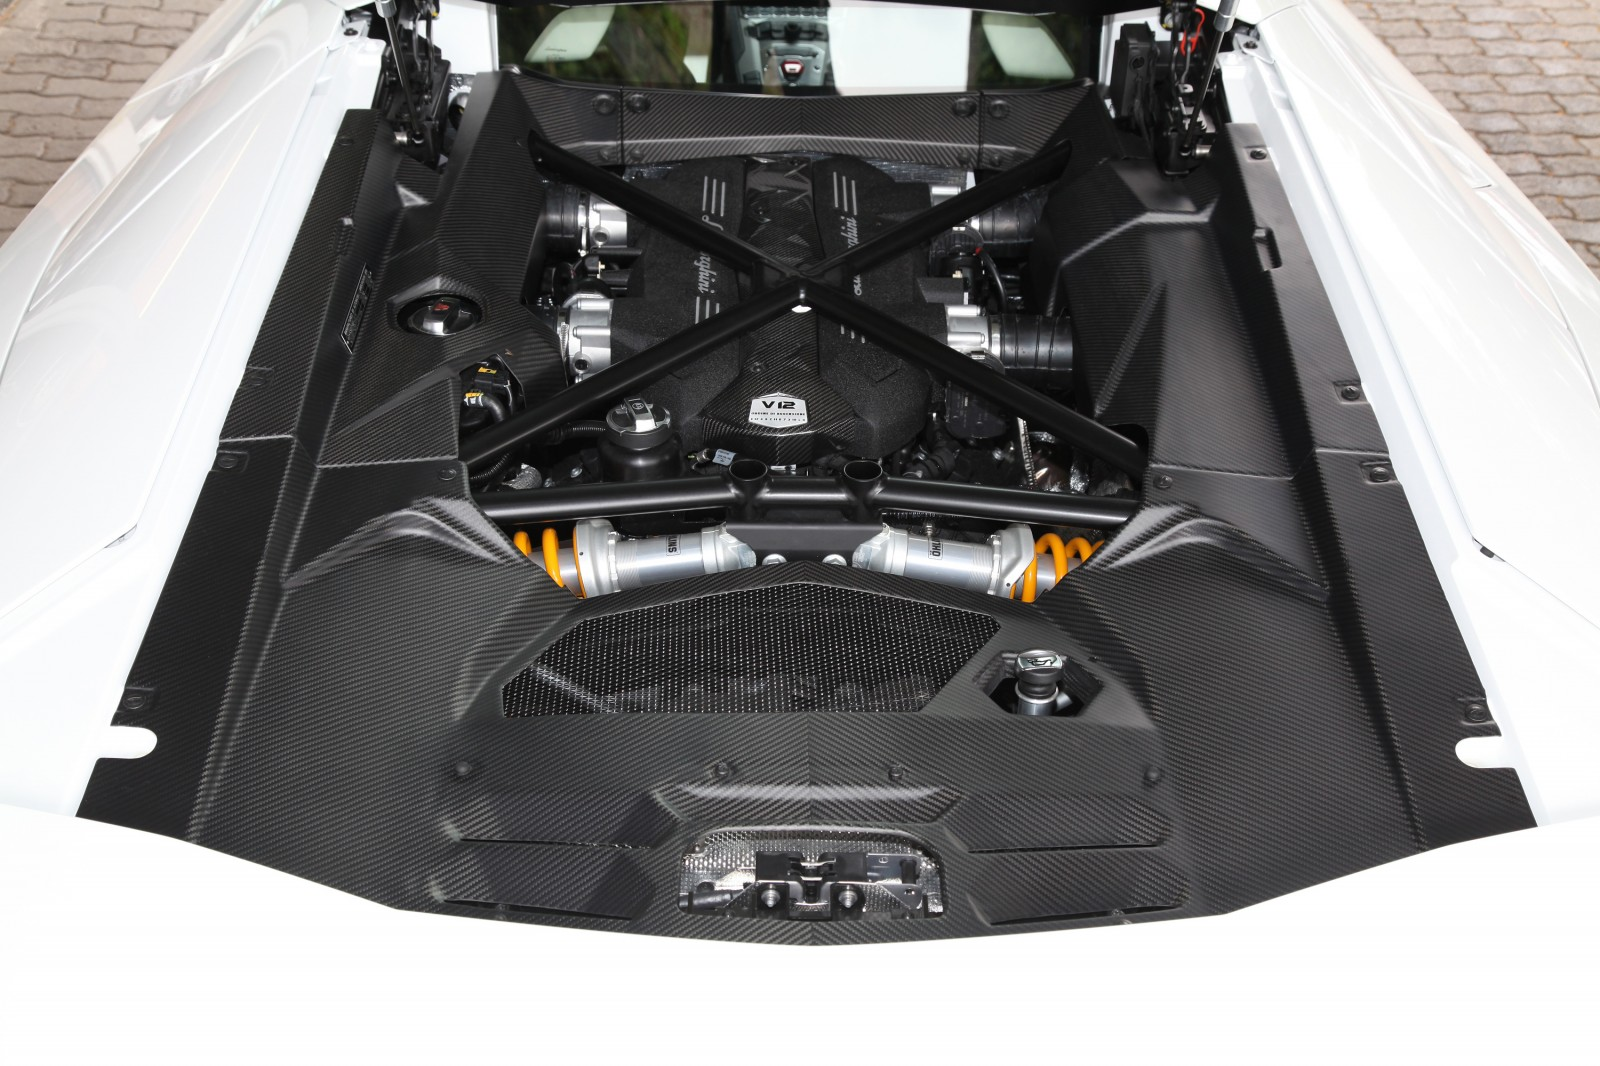 Lamborghini Aventador Becomes A Real Screamer With CAPRISTO Exhaust Upgrade 18